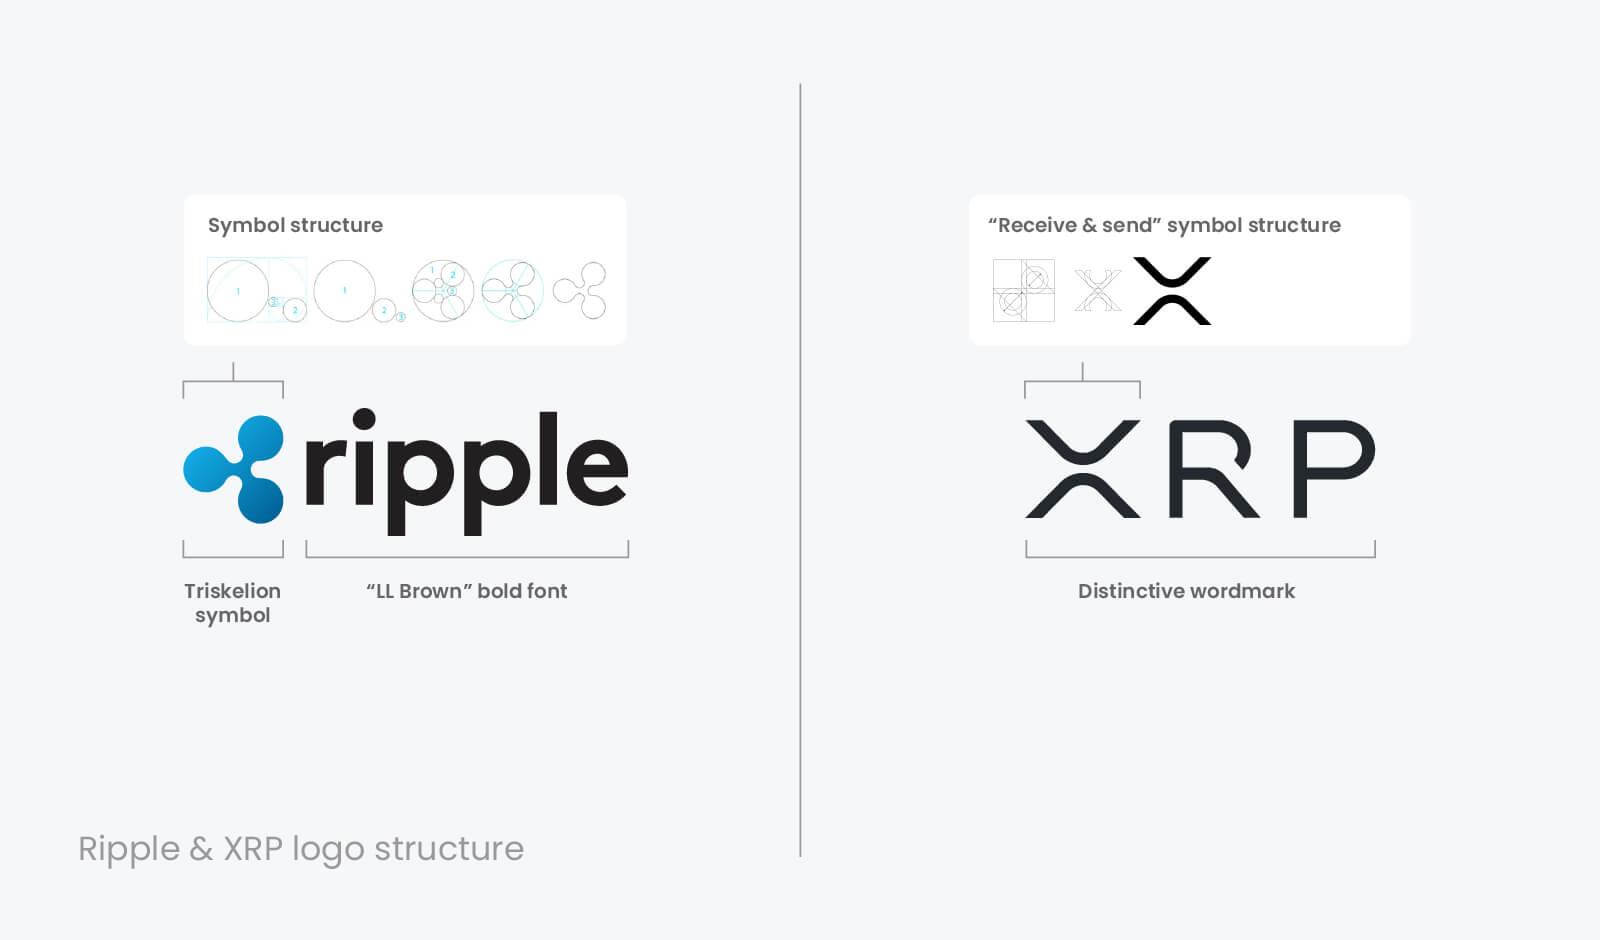 ripple (xrp) logo symbol